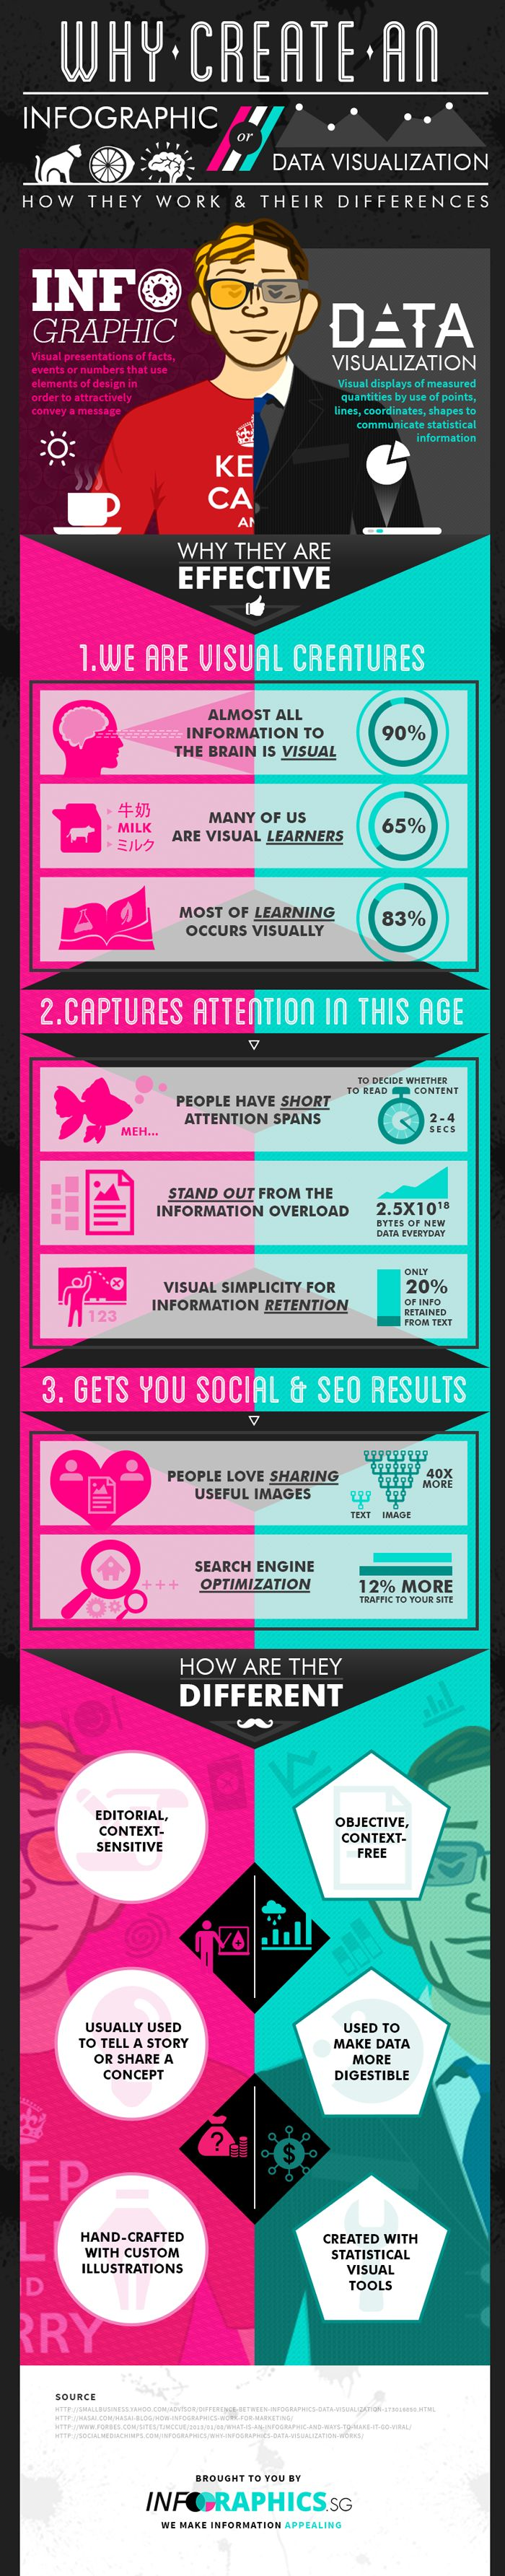 Why Infographics #infografia #infographic #marketing